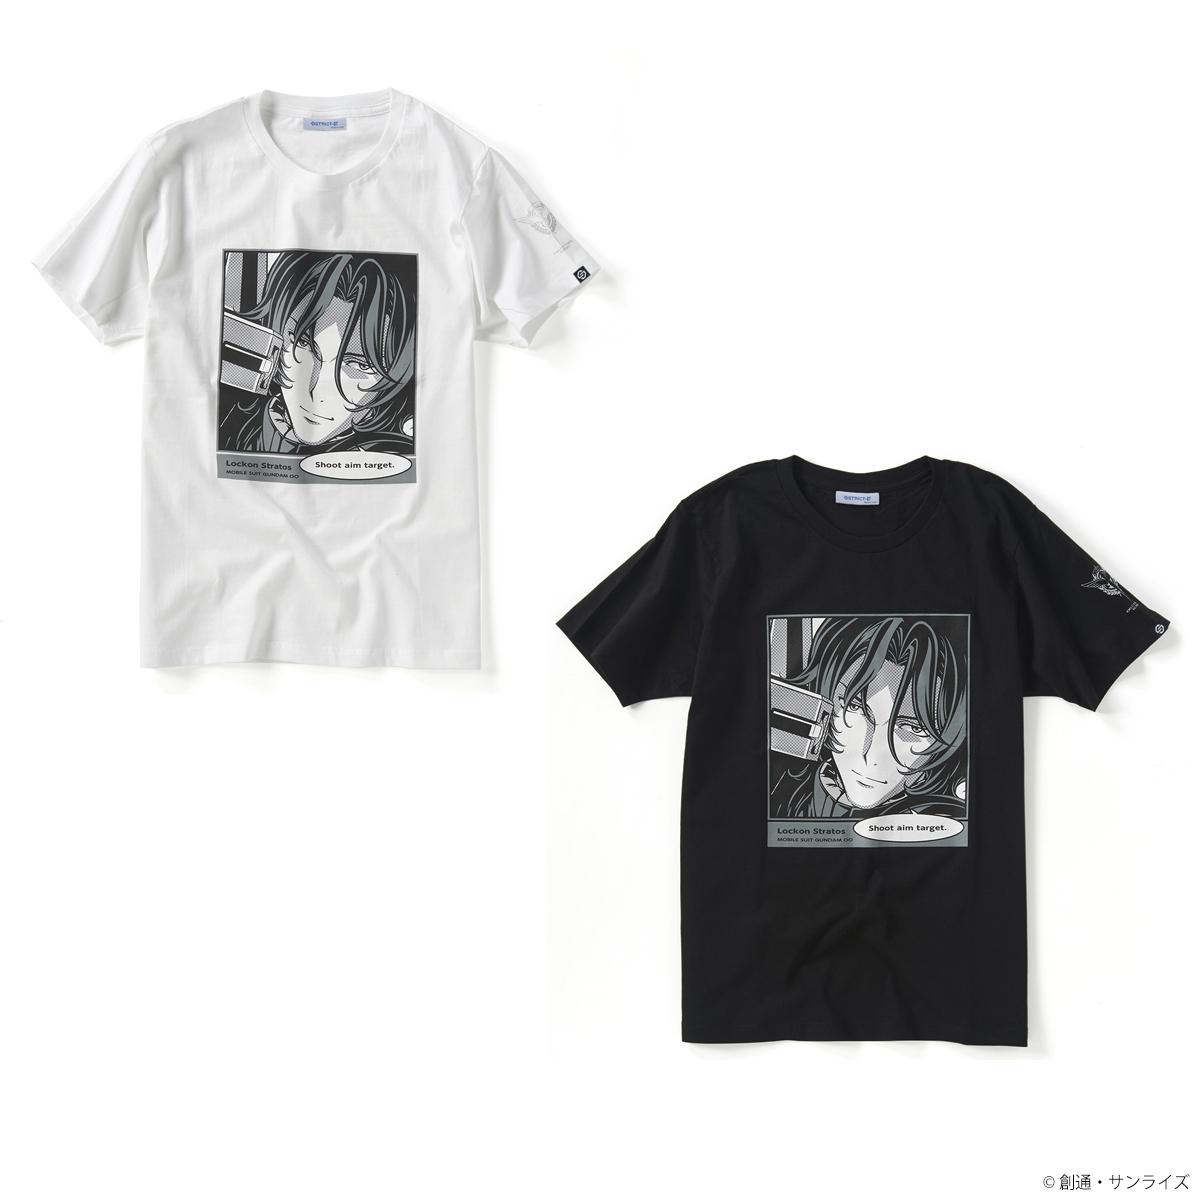 STRICT-G 『機動戦士ガンダム00』 POP ART Tシャツ ロックオン・ストラトス